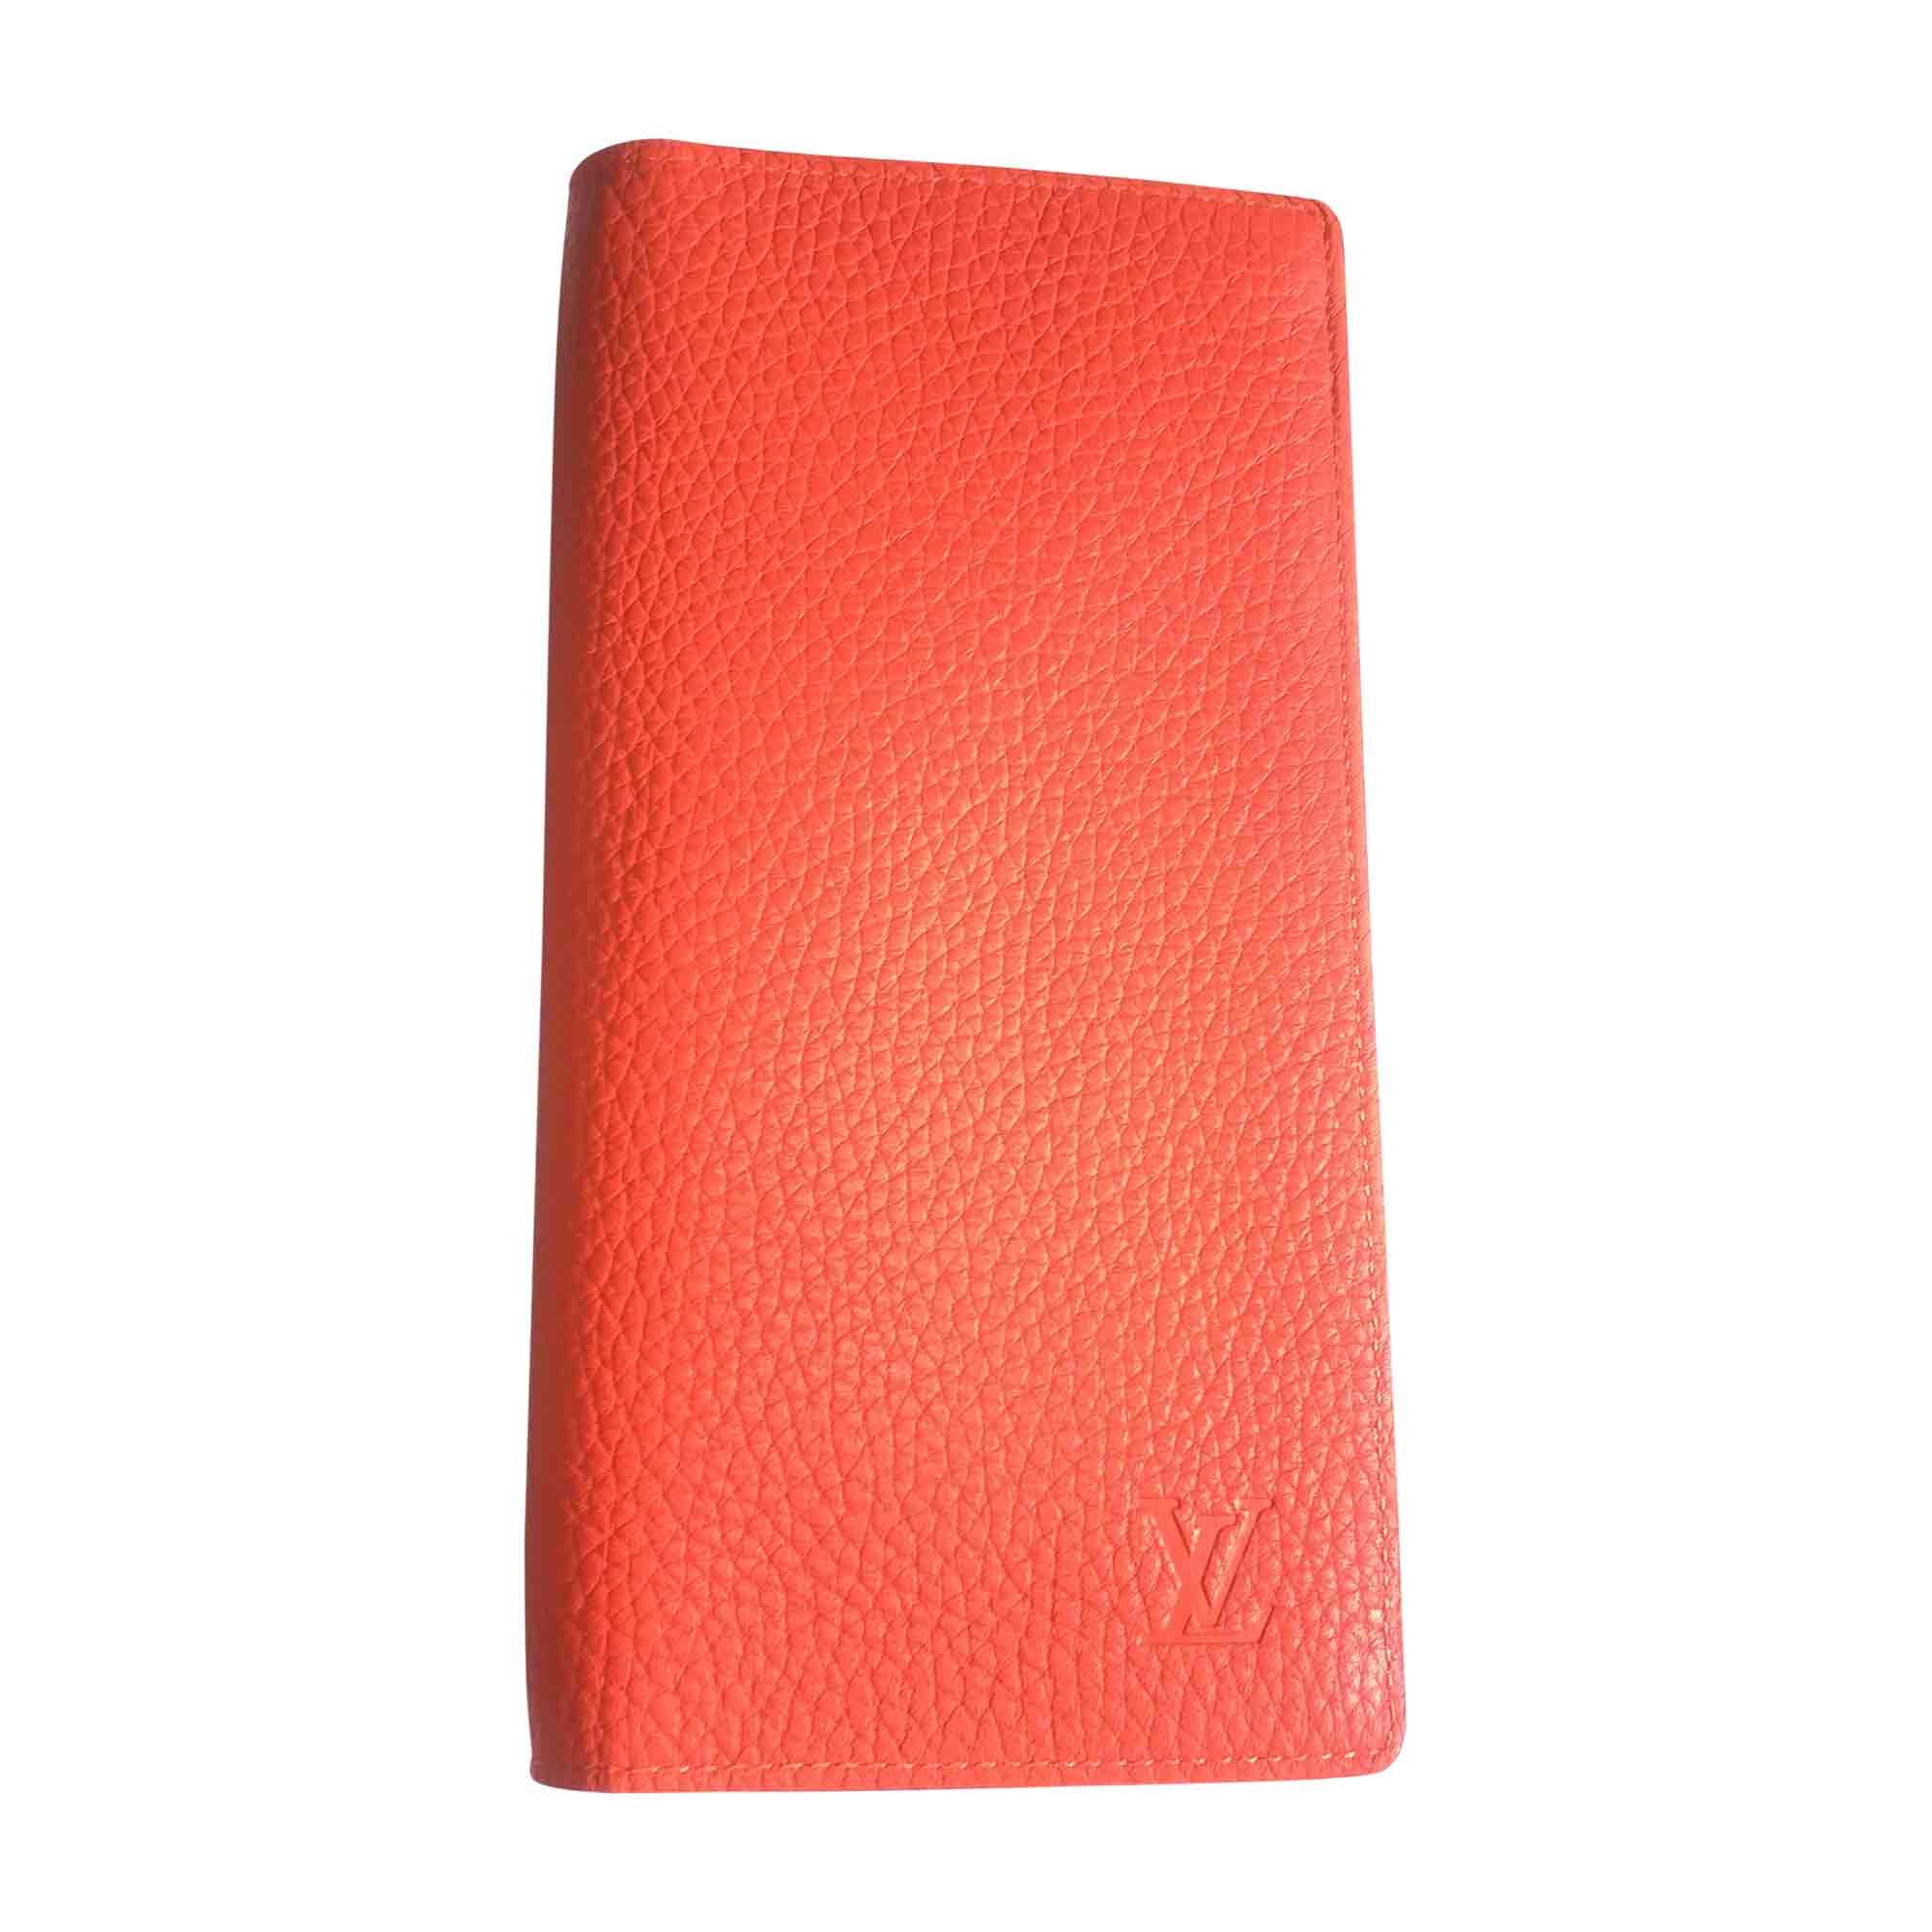 Portefeuille LOUIS VUITTON orange vendu par Maomao 8520406 - 5828865 35c10fbe2c2